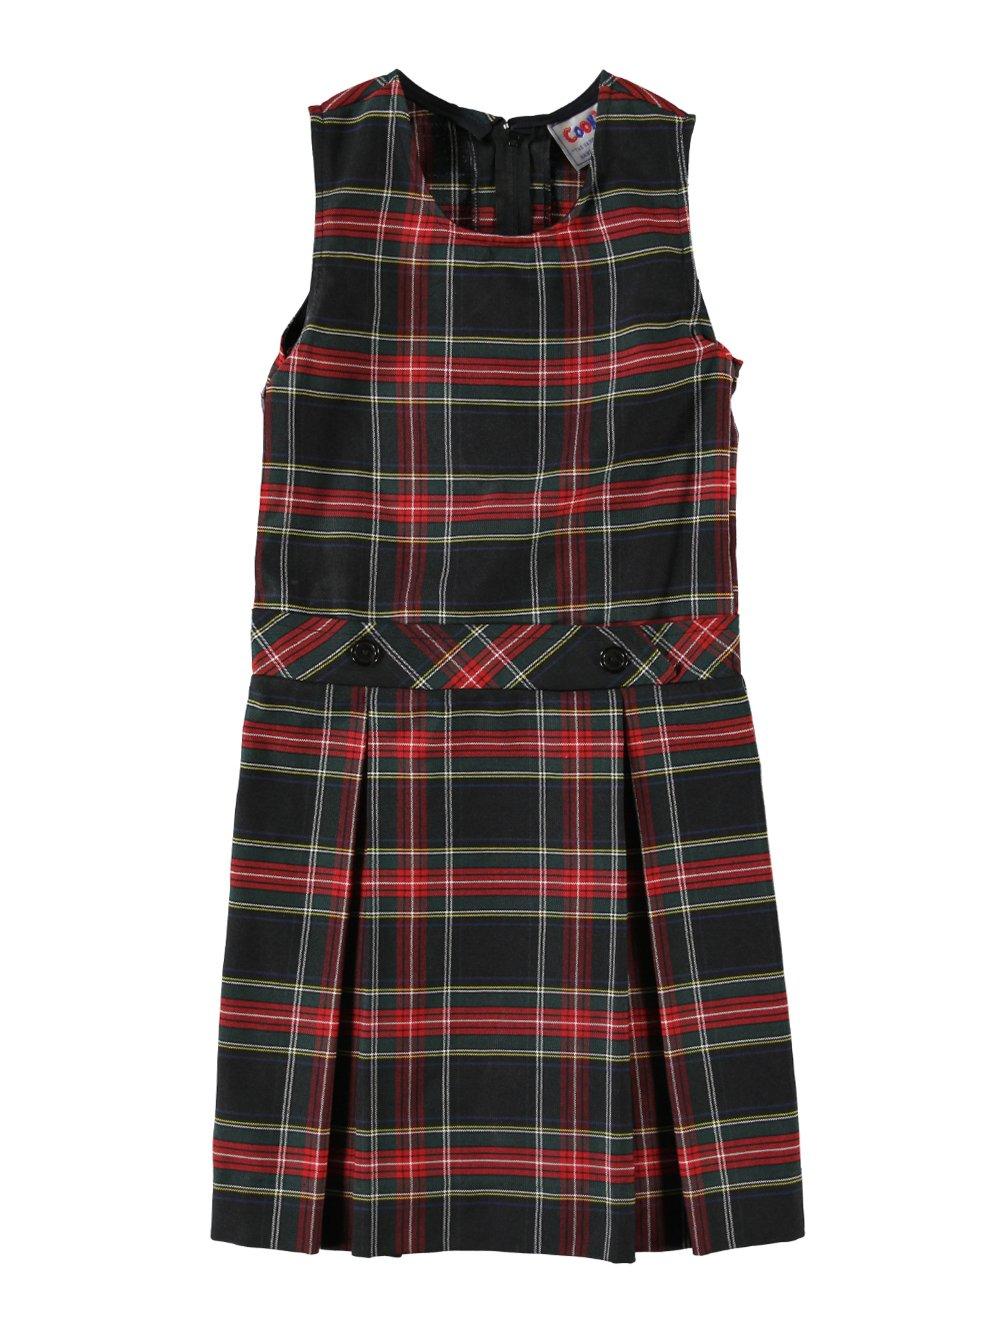 Cookie's Brand Big Girls' Bib Front Jumper with Kick Pleats - black/red/white